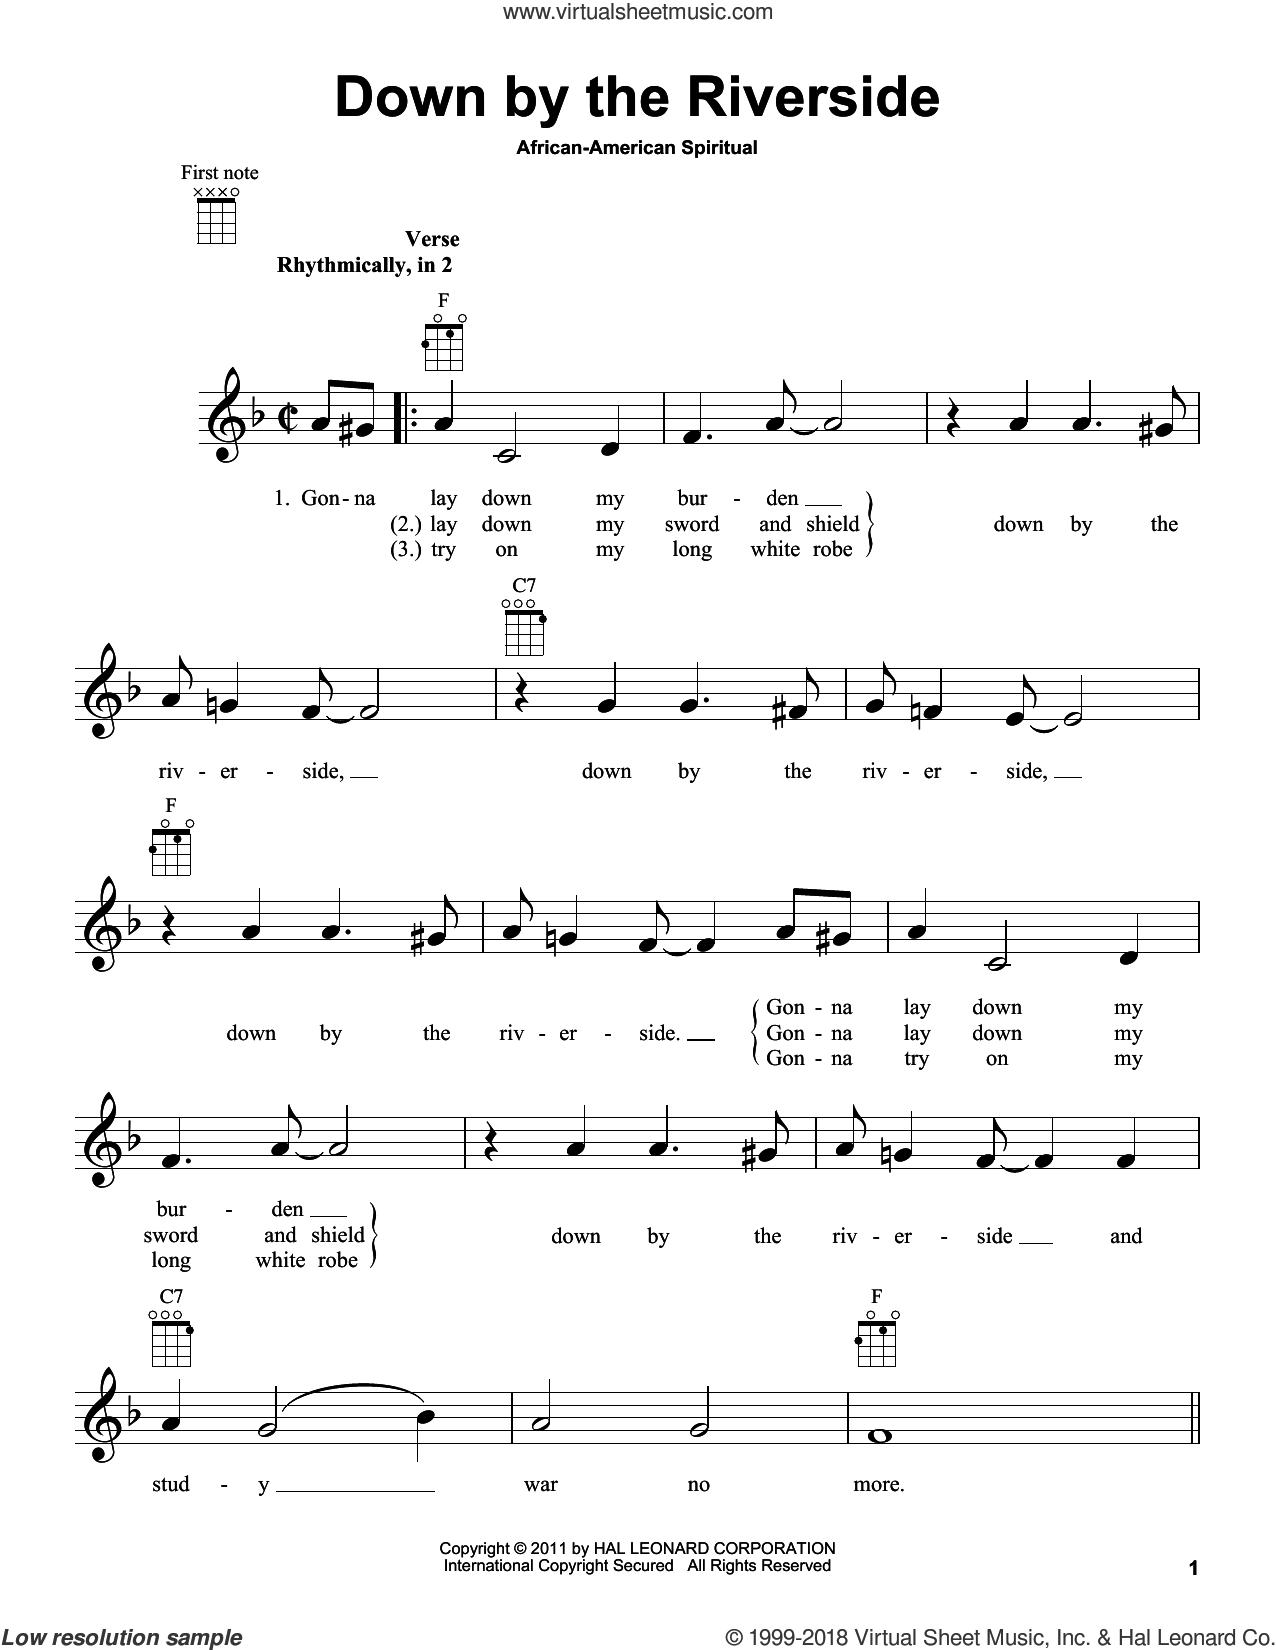 Down By The Riverside sheet music for ukulele, intermediate skill level